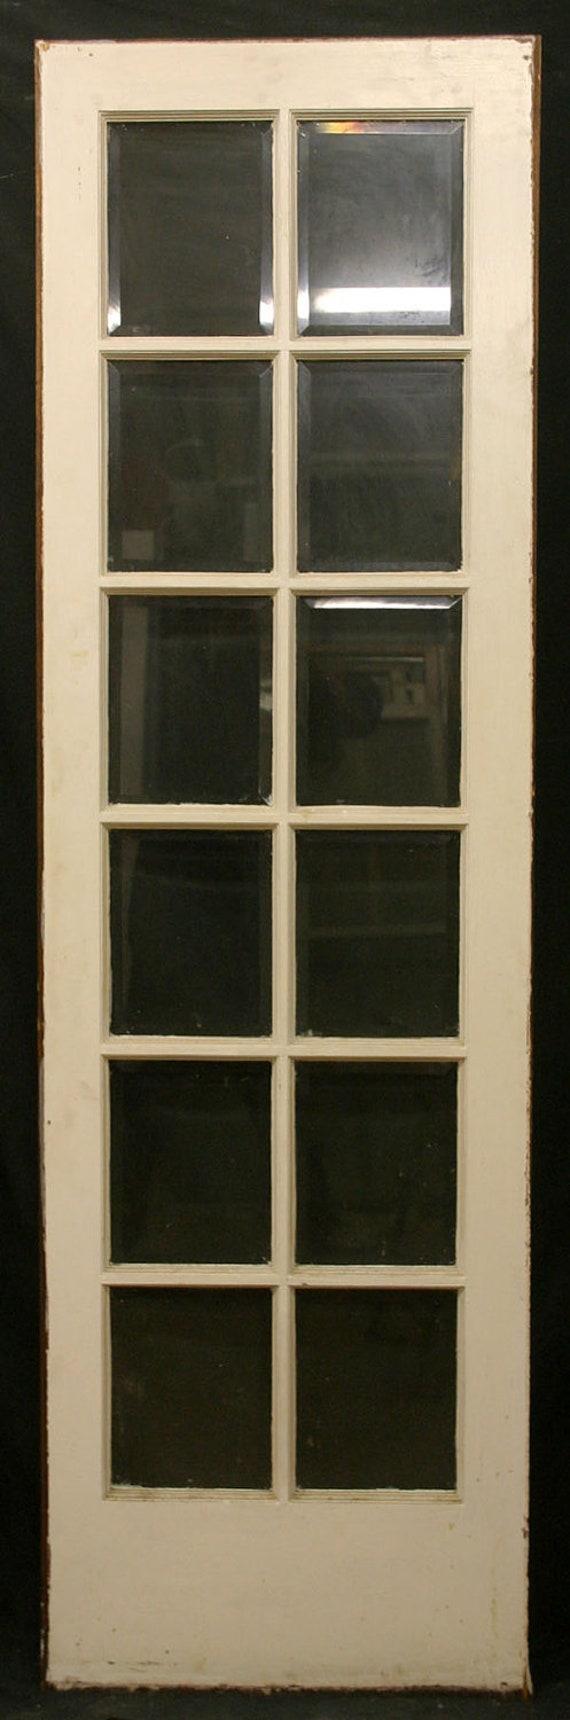 pair 2 antique 24x80 exterior entry door side